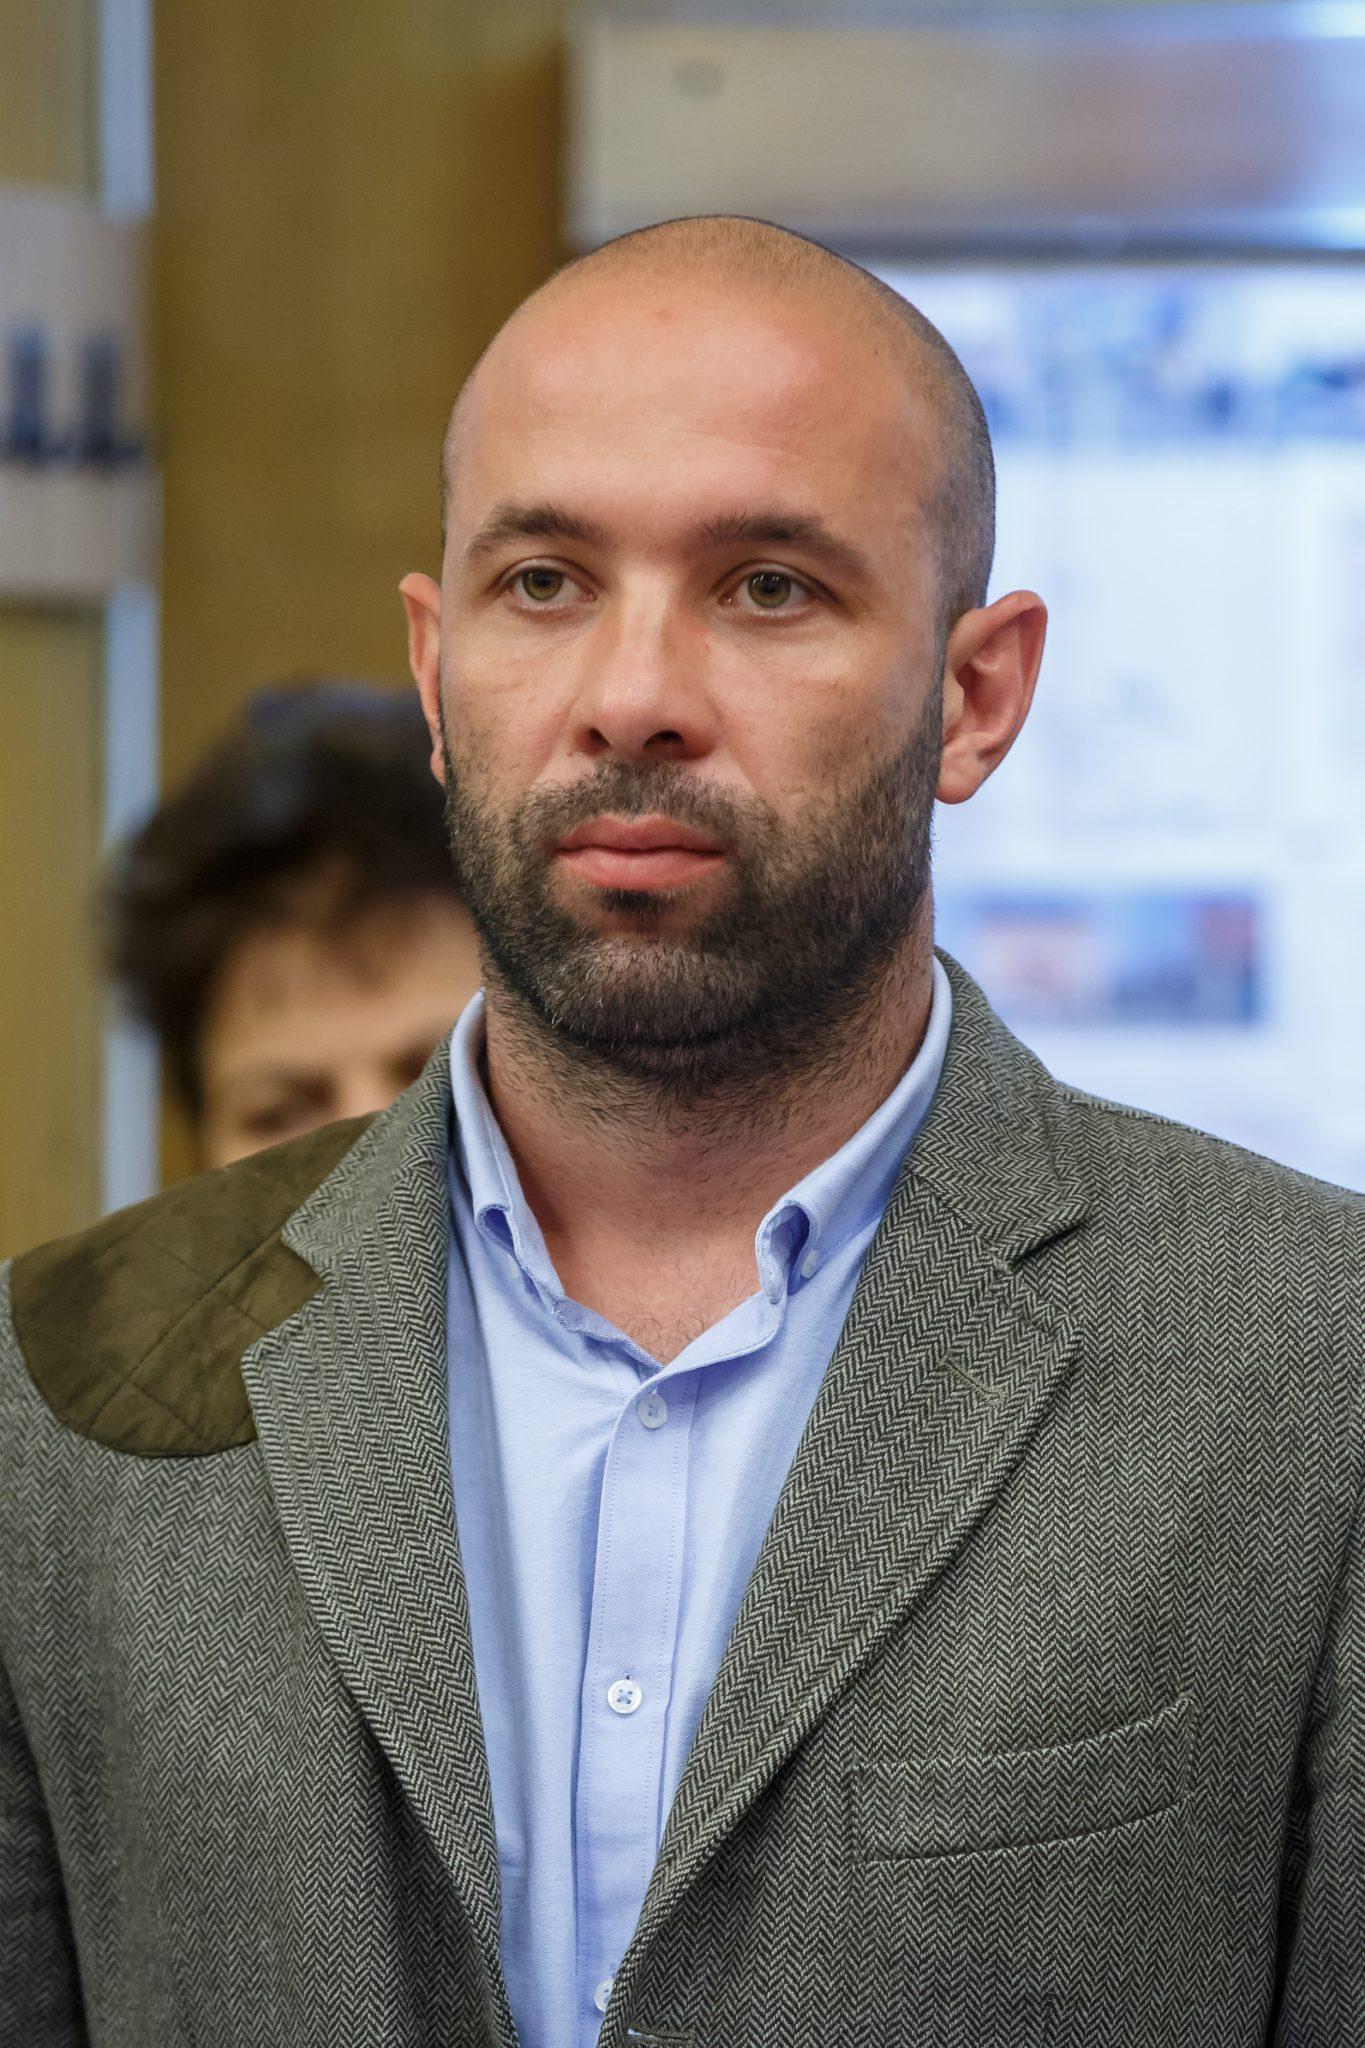 Ioan Sabin Sărmaș